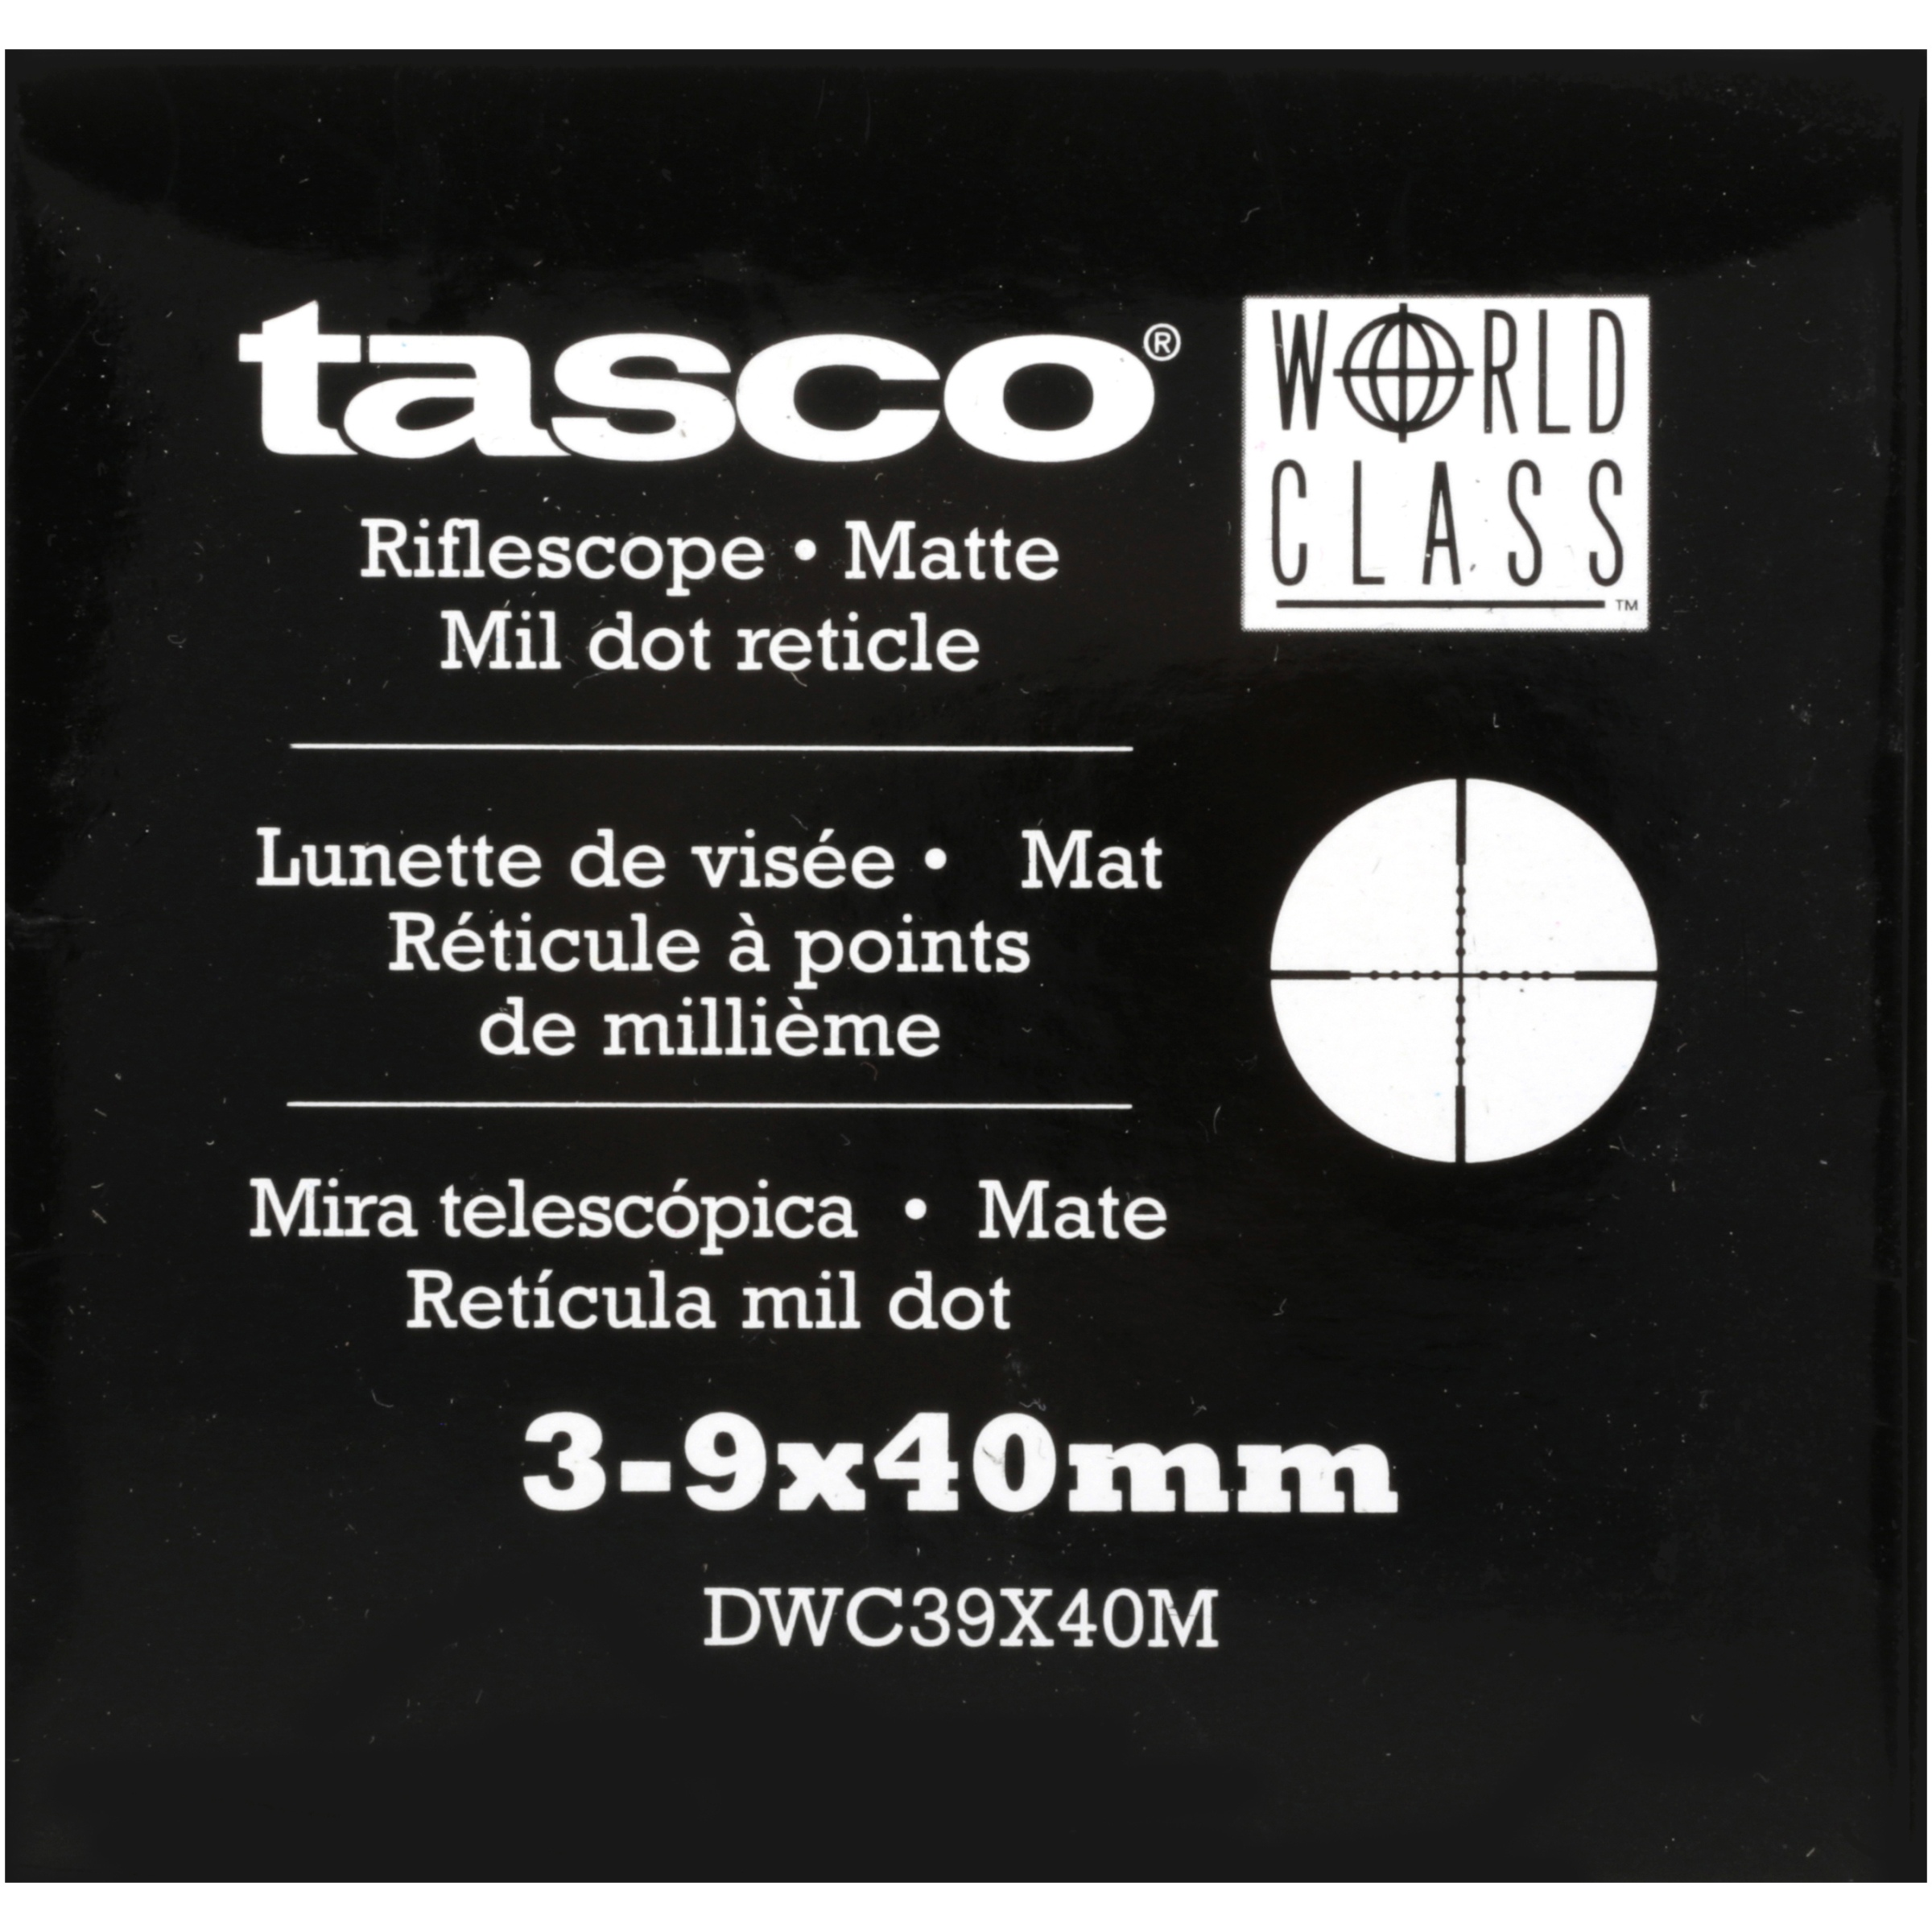 Tasco World Class DWC39X40M 3-9X40MM Black Matte True Mil-Dot Ret Box by Bushnell Corporation